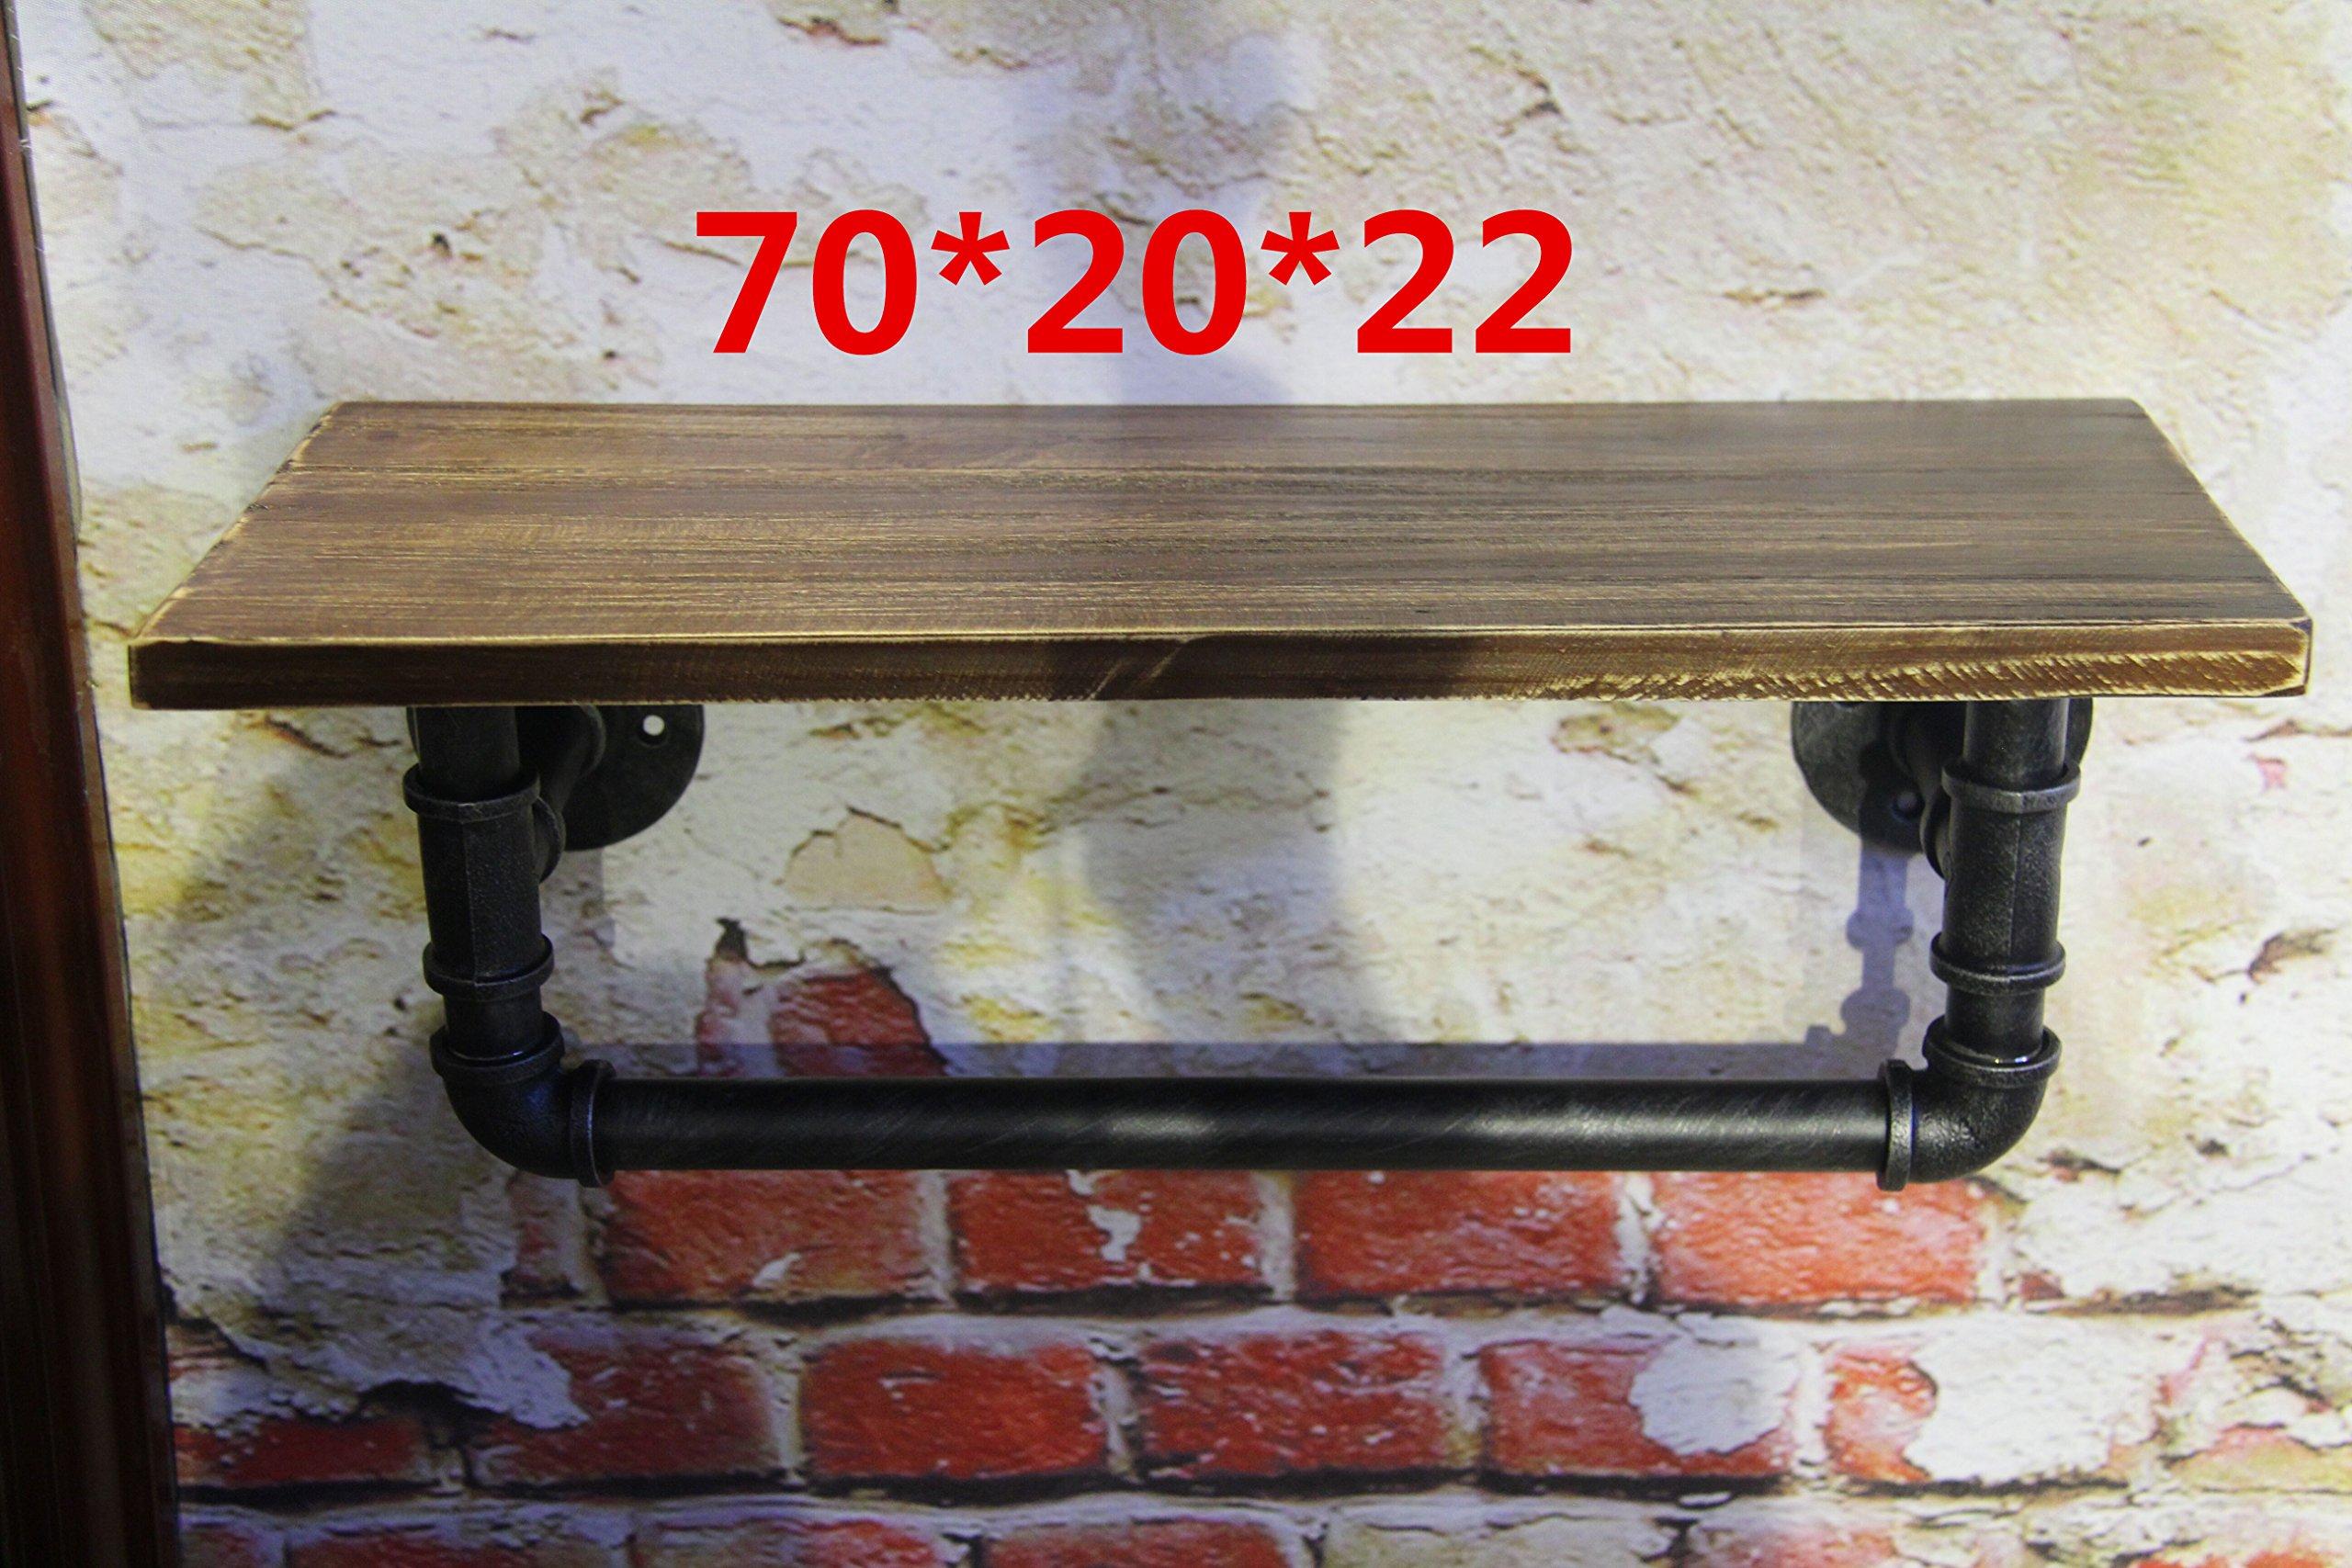 Yomiokla Bathroom Accessories - Kitchen, Toilet, Balcony and Bathroom Metal Towel Ring American Village Retro Industrial air Iron Pipes to Solid Wood Wall Shelf Racks 702022